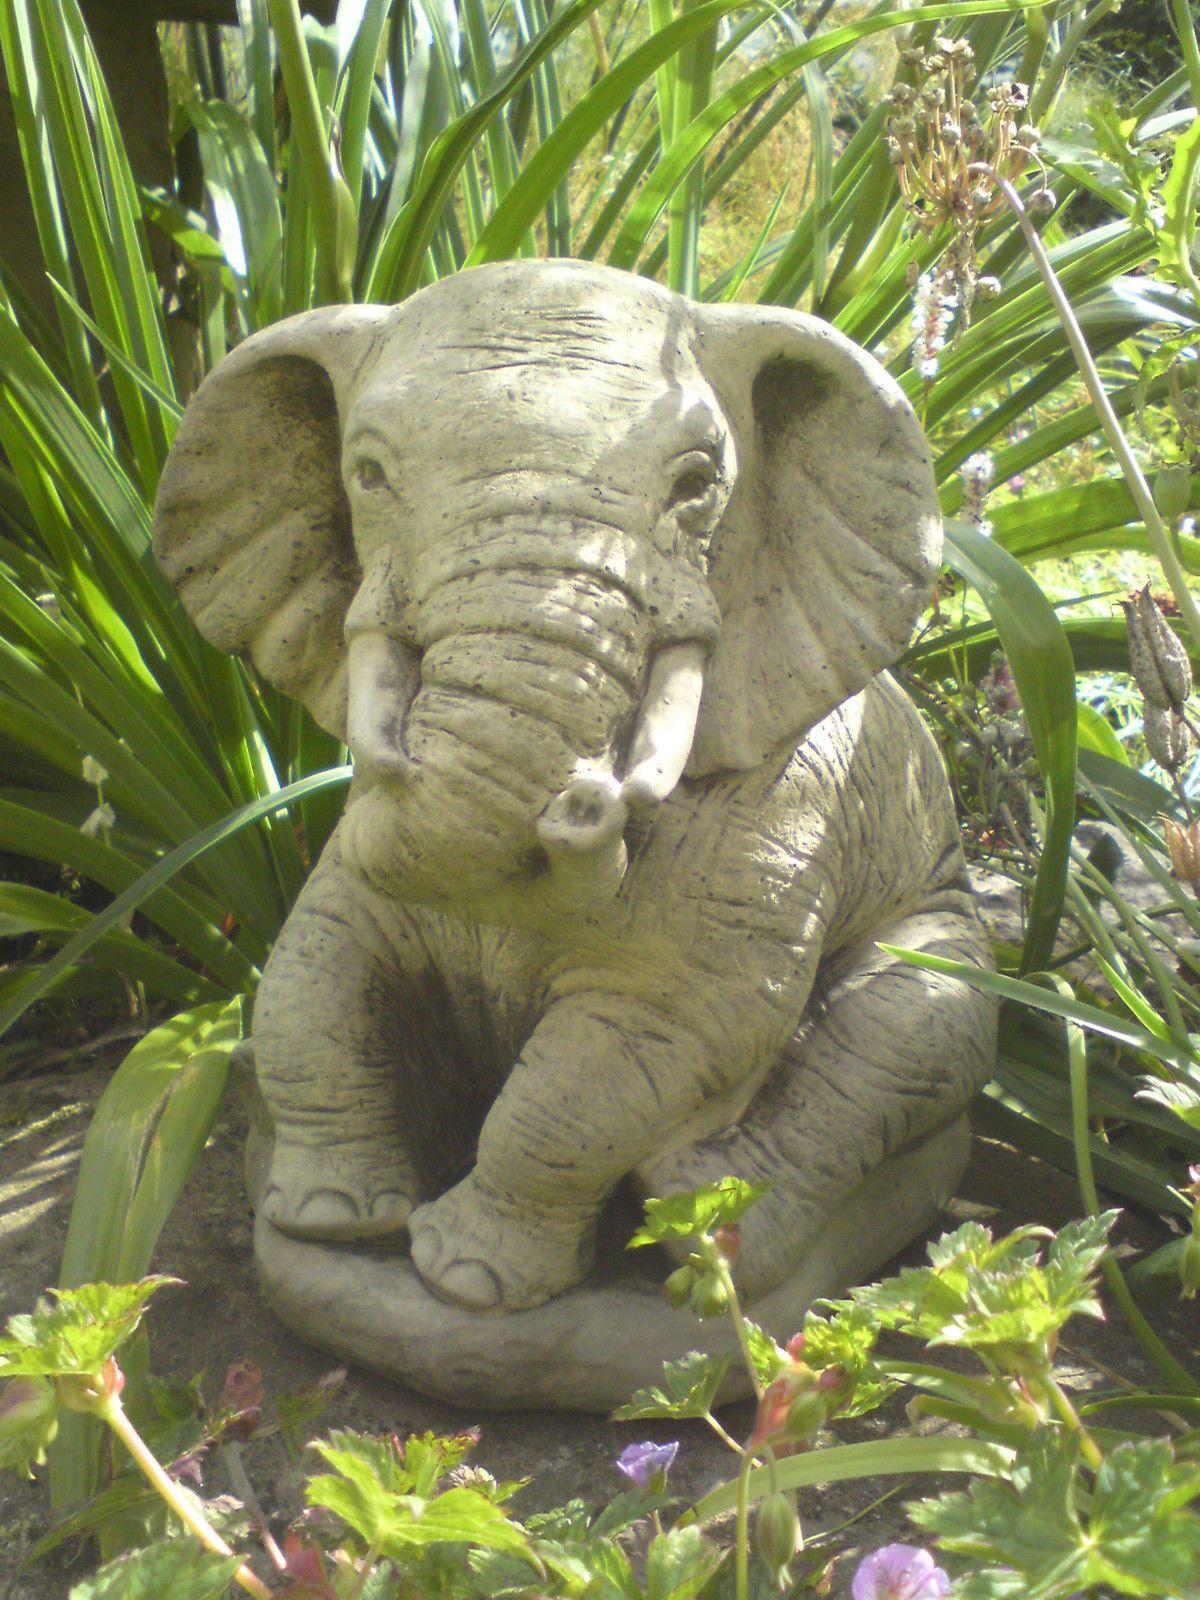 Merveilleux Stone Garden Lucky Sitting Elephant Ornament